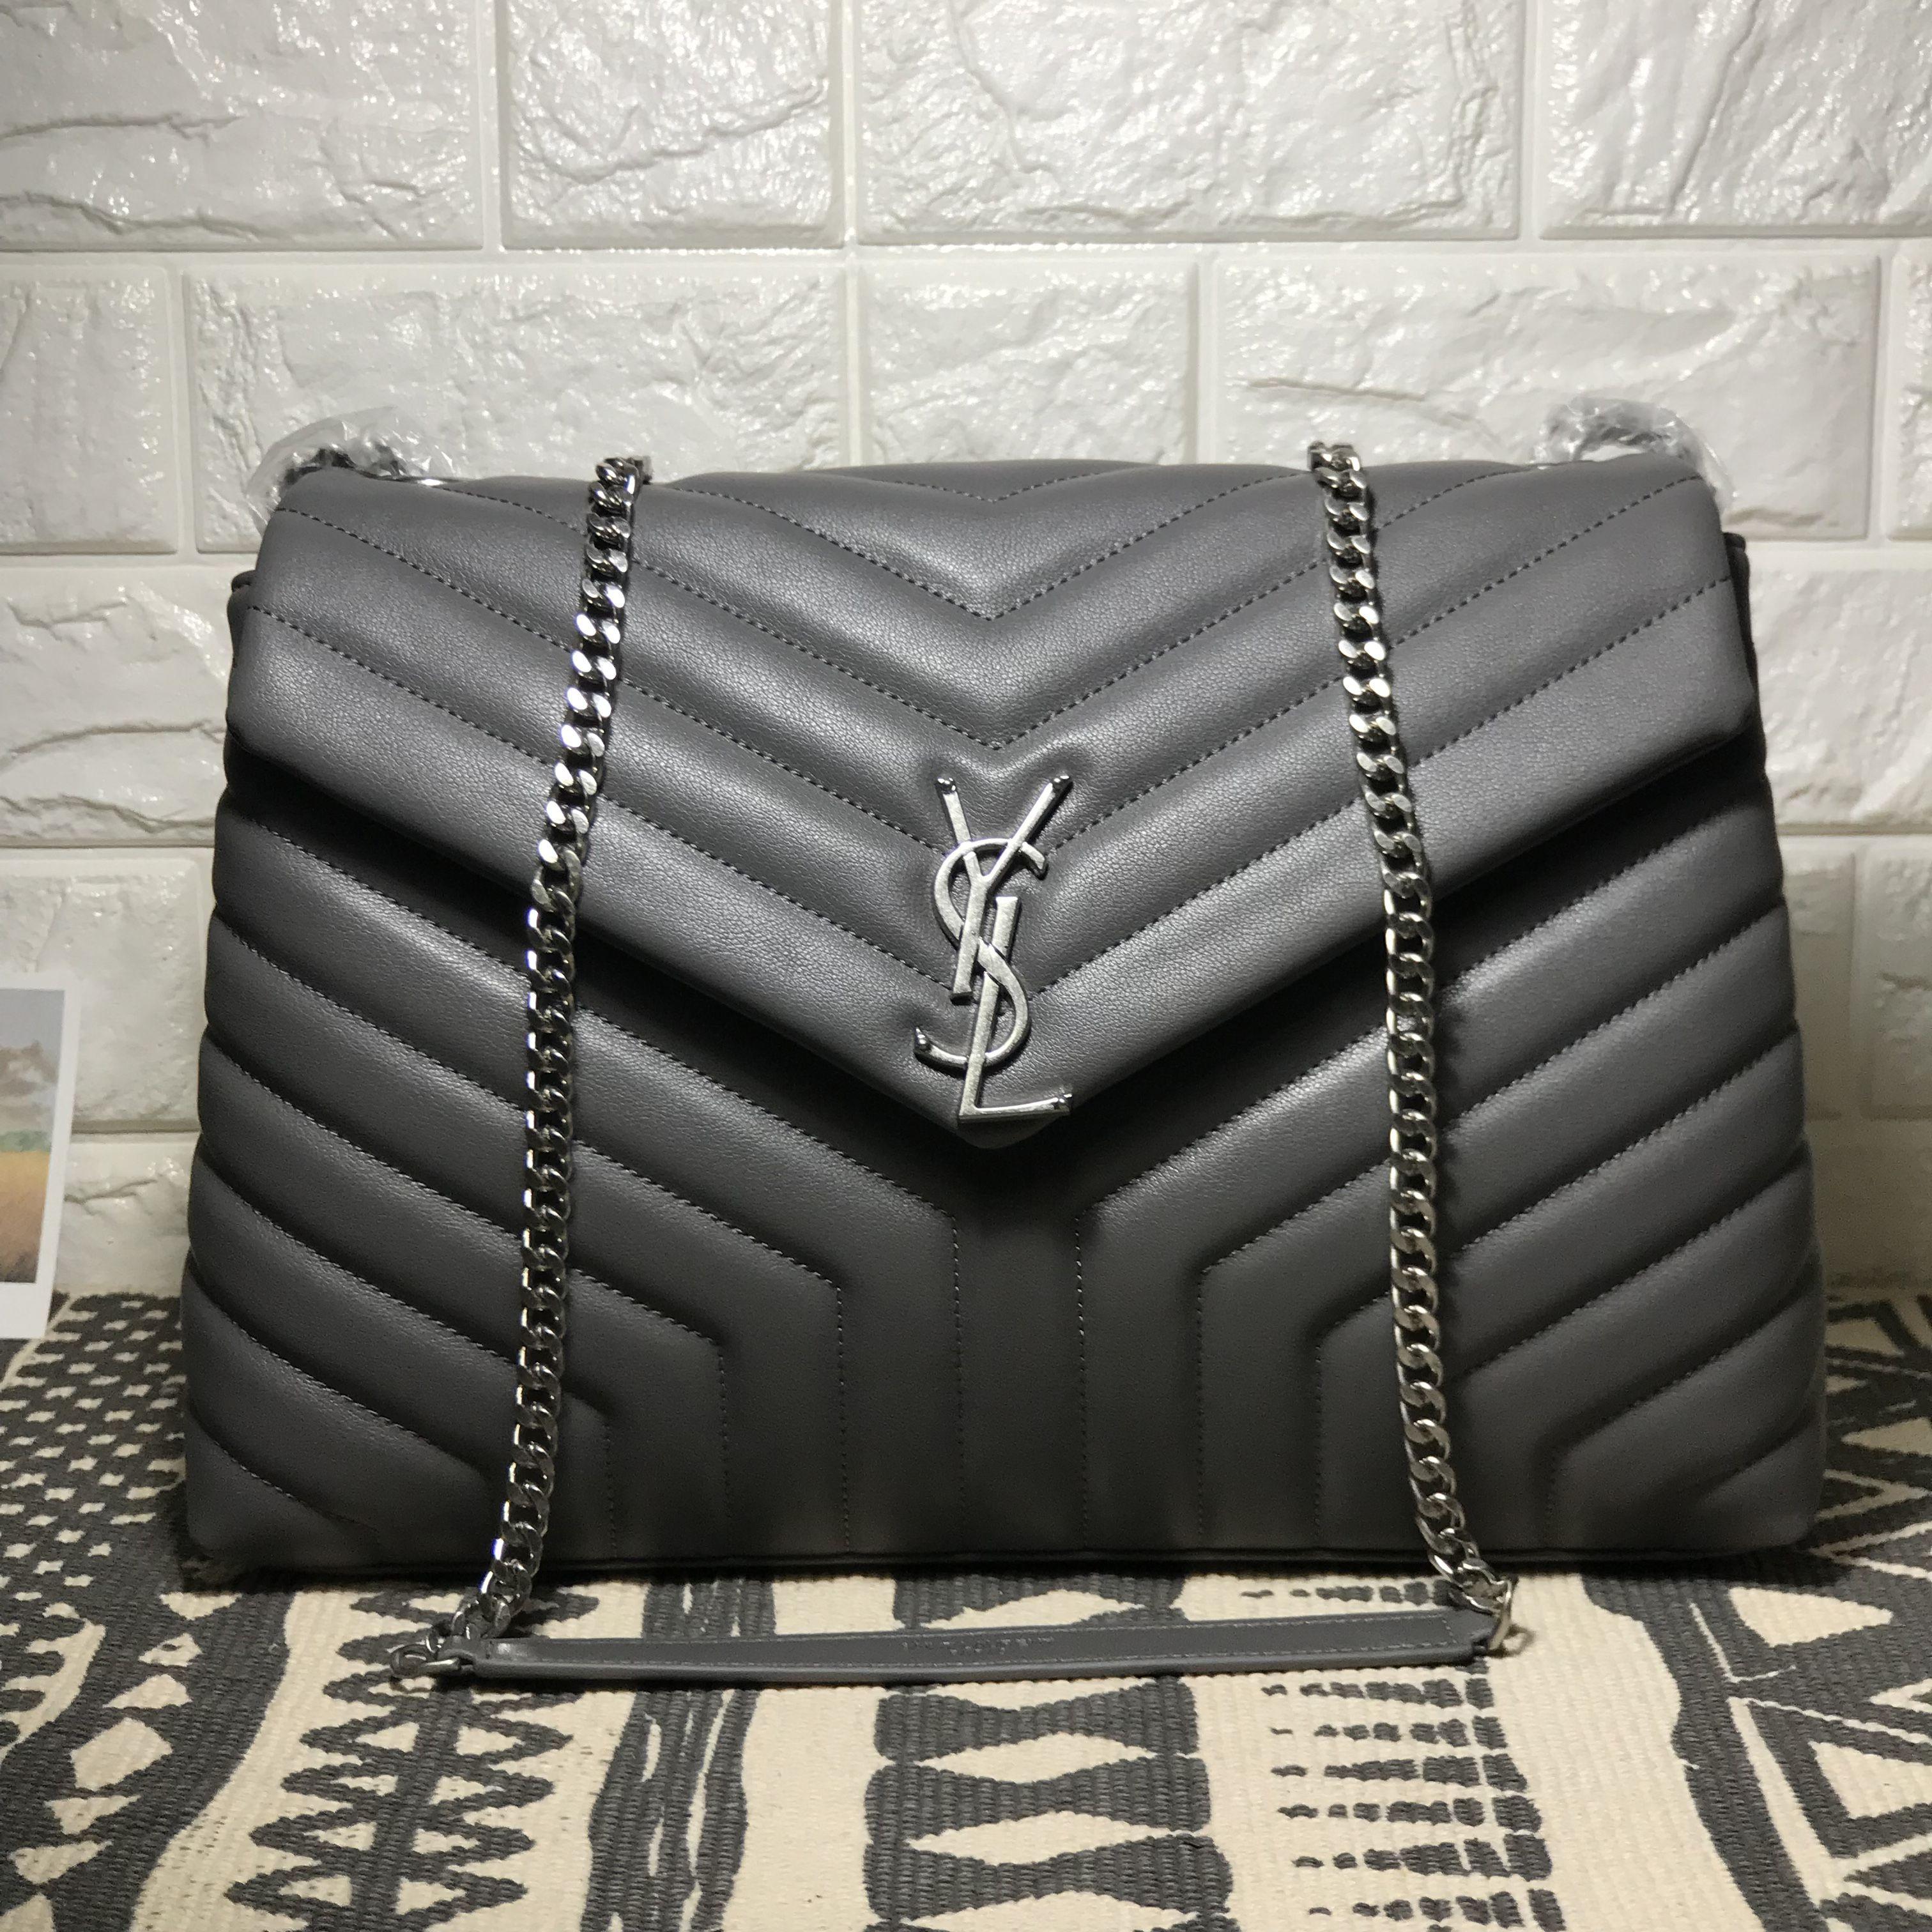 Chain Shoulder Bag Ysl Purse